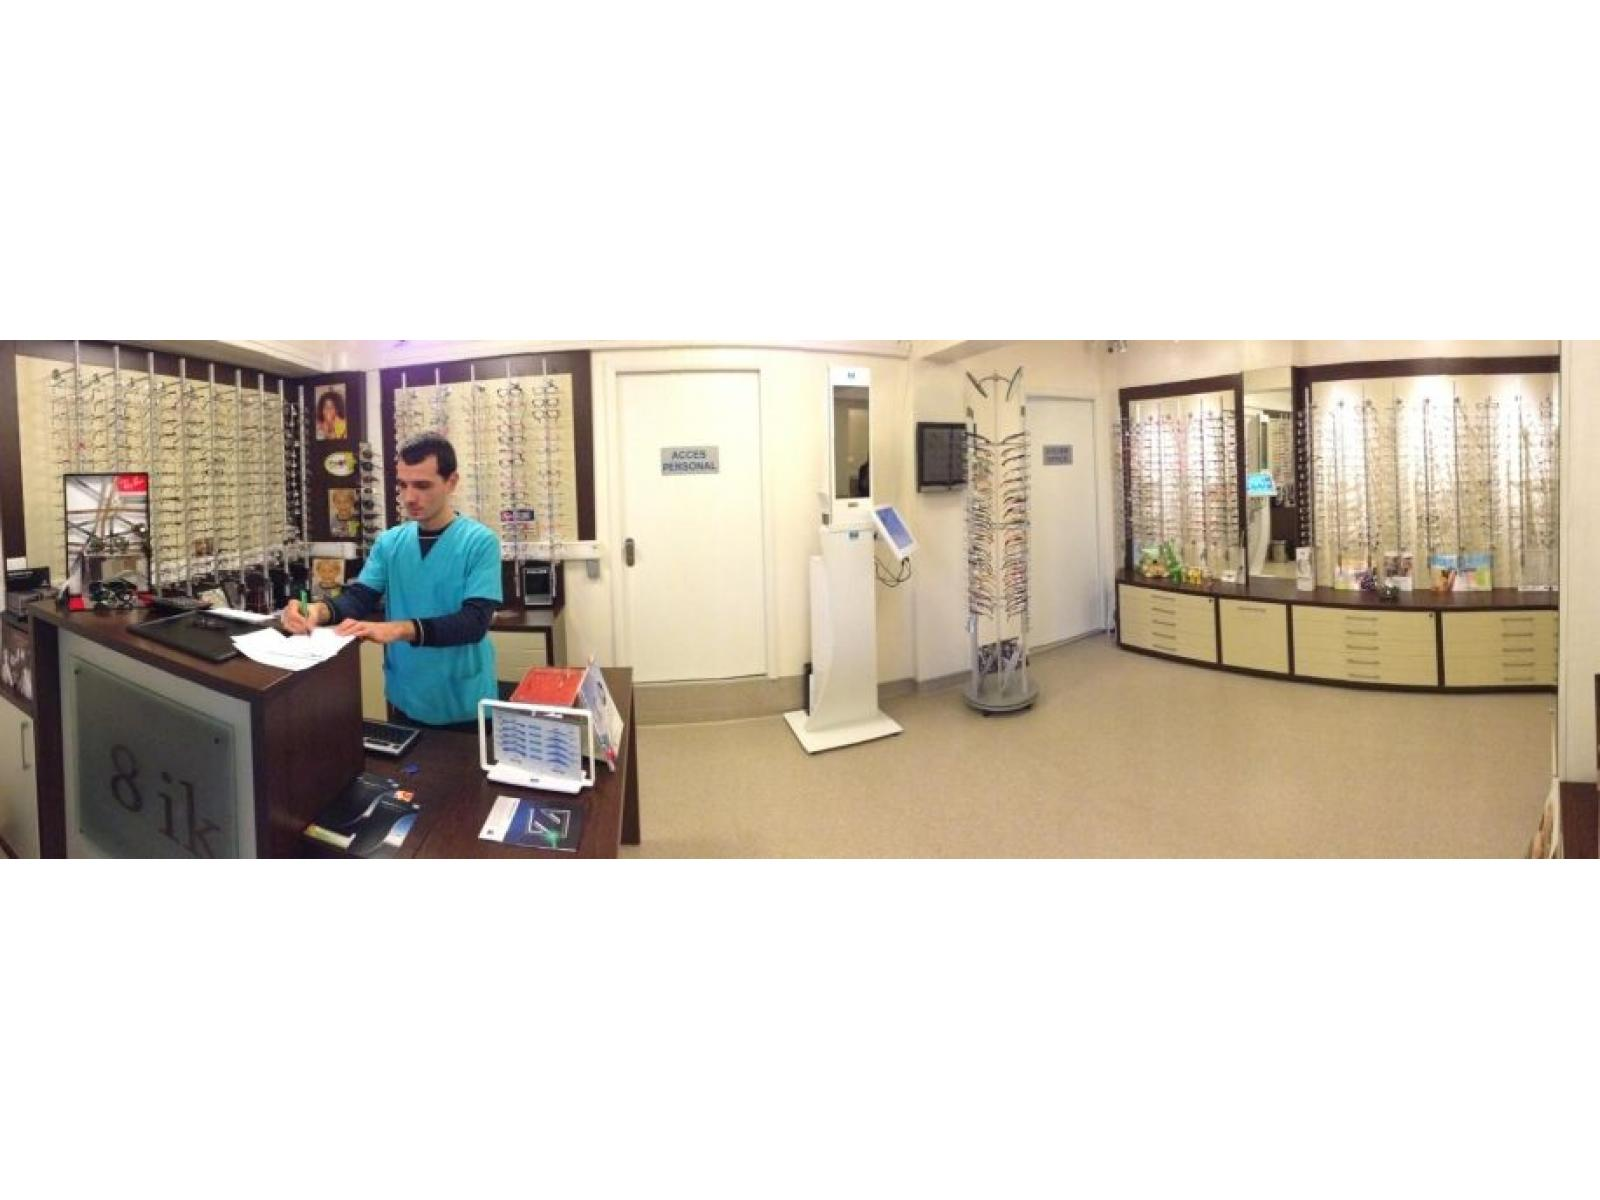 AMA OPTIMEX - Clinica de oftalmologie - Clinica_Ama_Optimex_Magazin_optica_medicala_-8ik.jpg